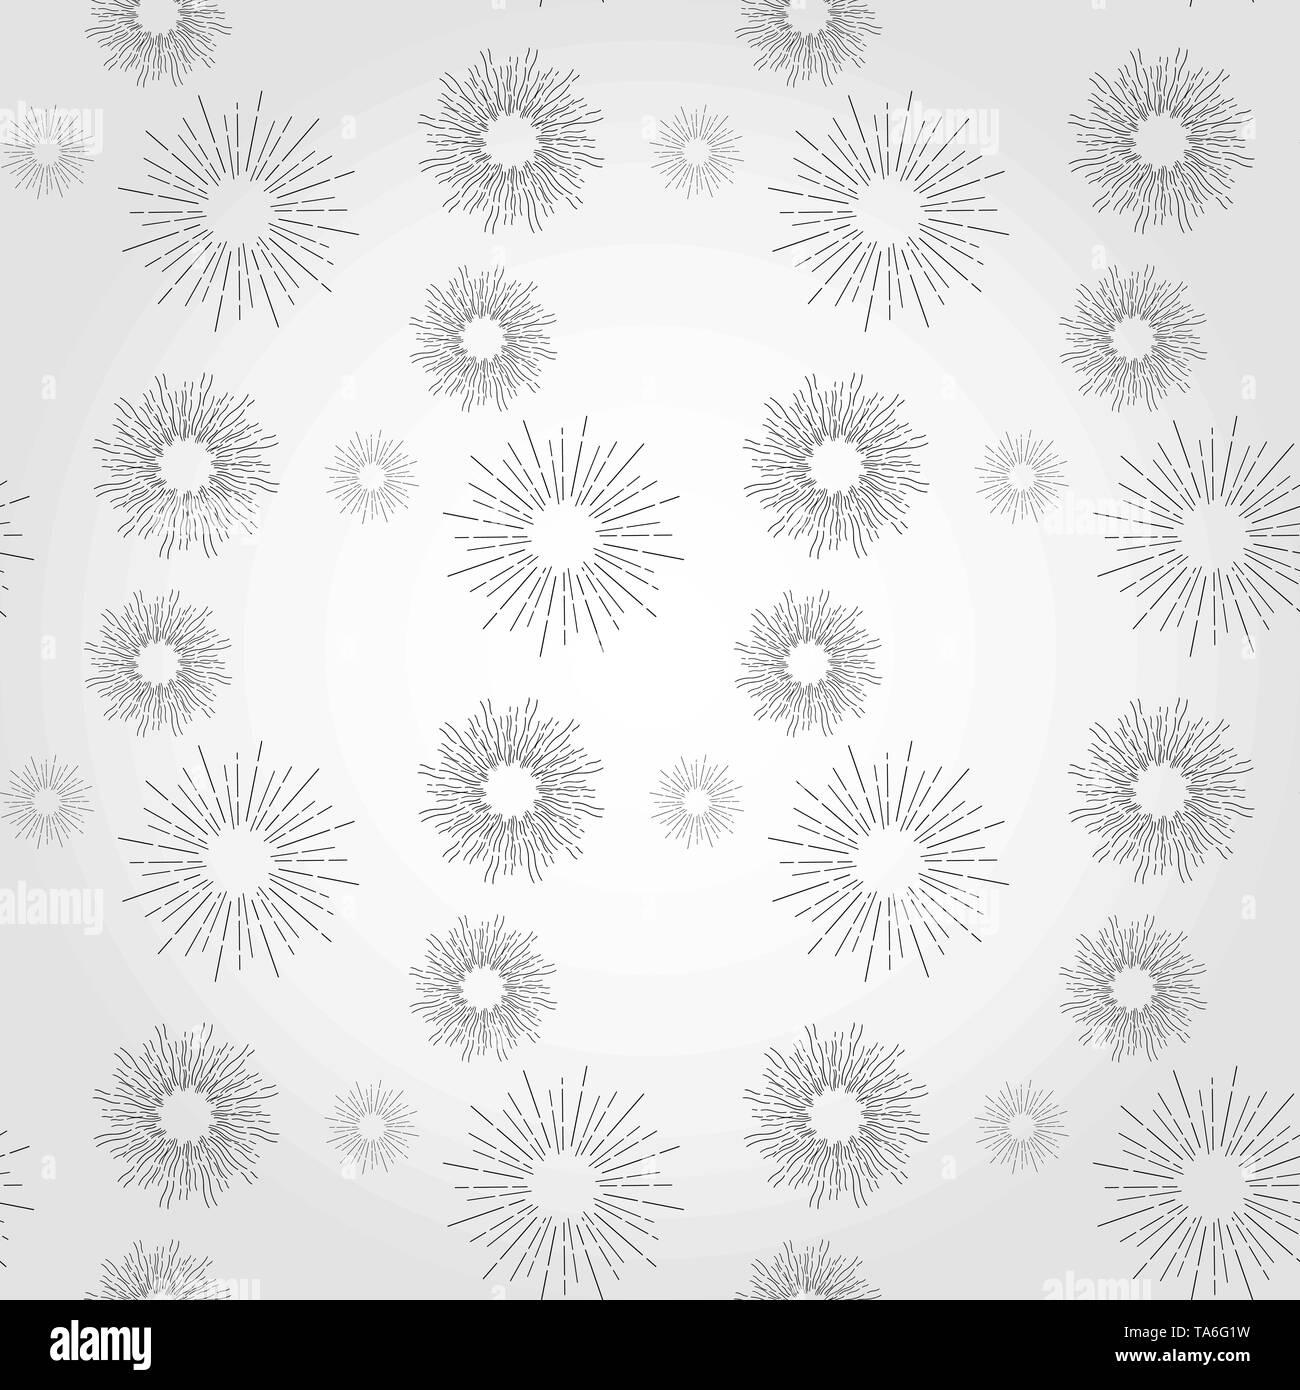 09e433ccb0a Sunshine rays seamless pattern in vintage style. Sunburst linear ...